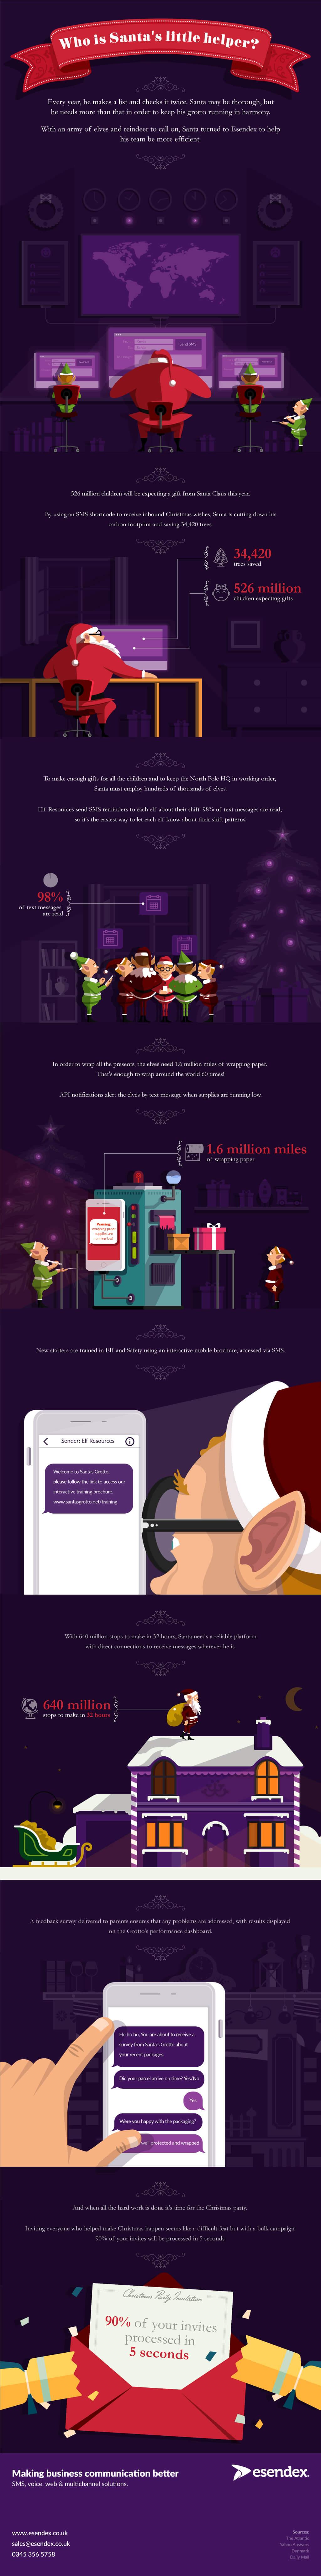 Santa's little helper infographic